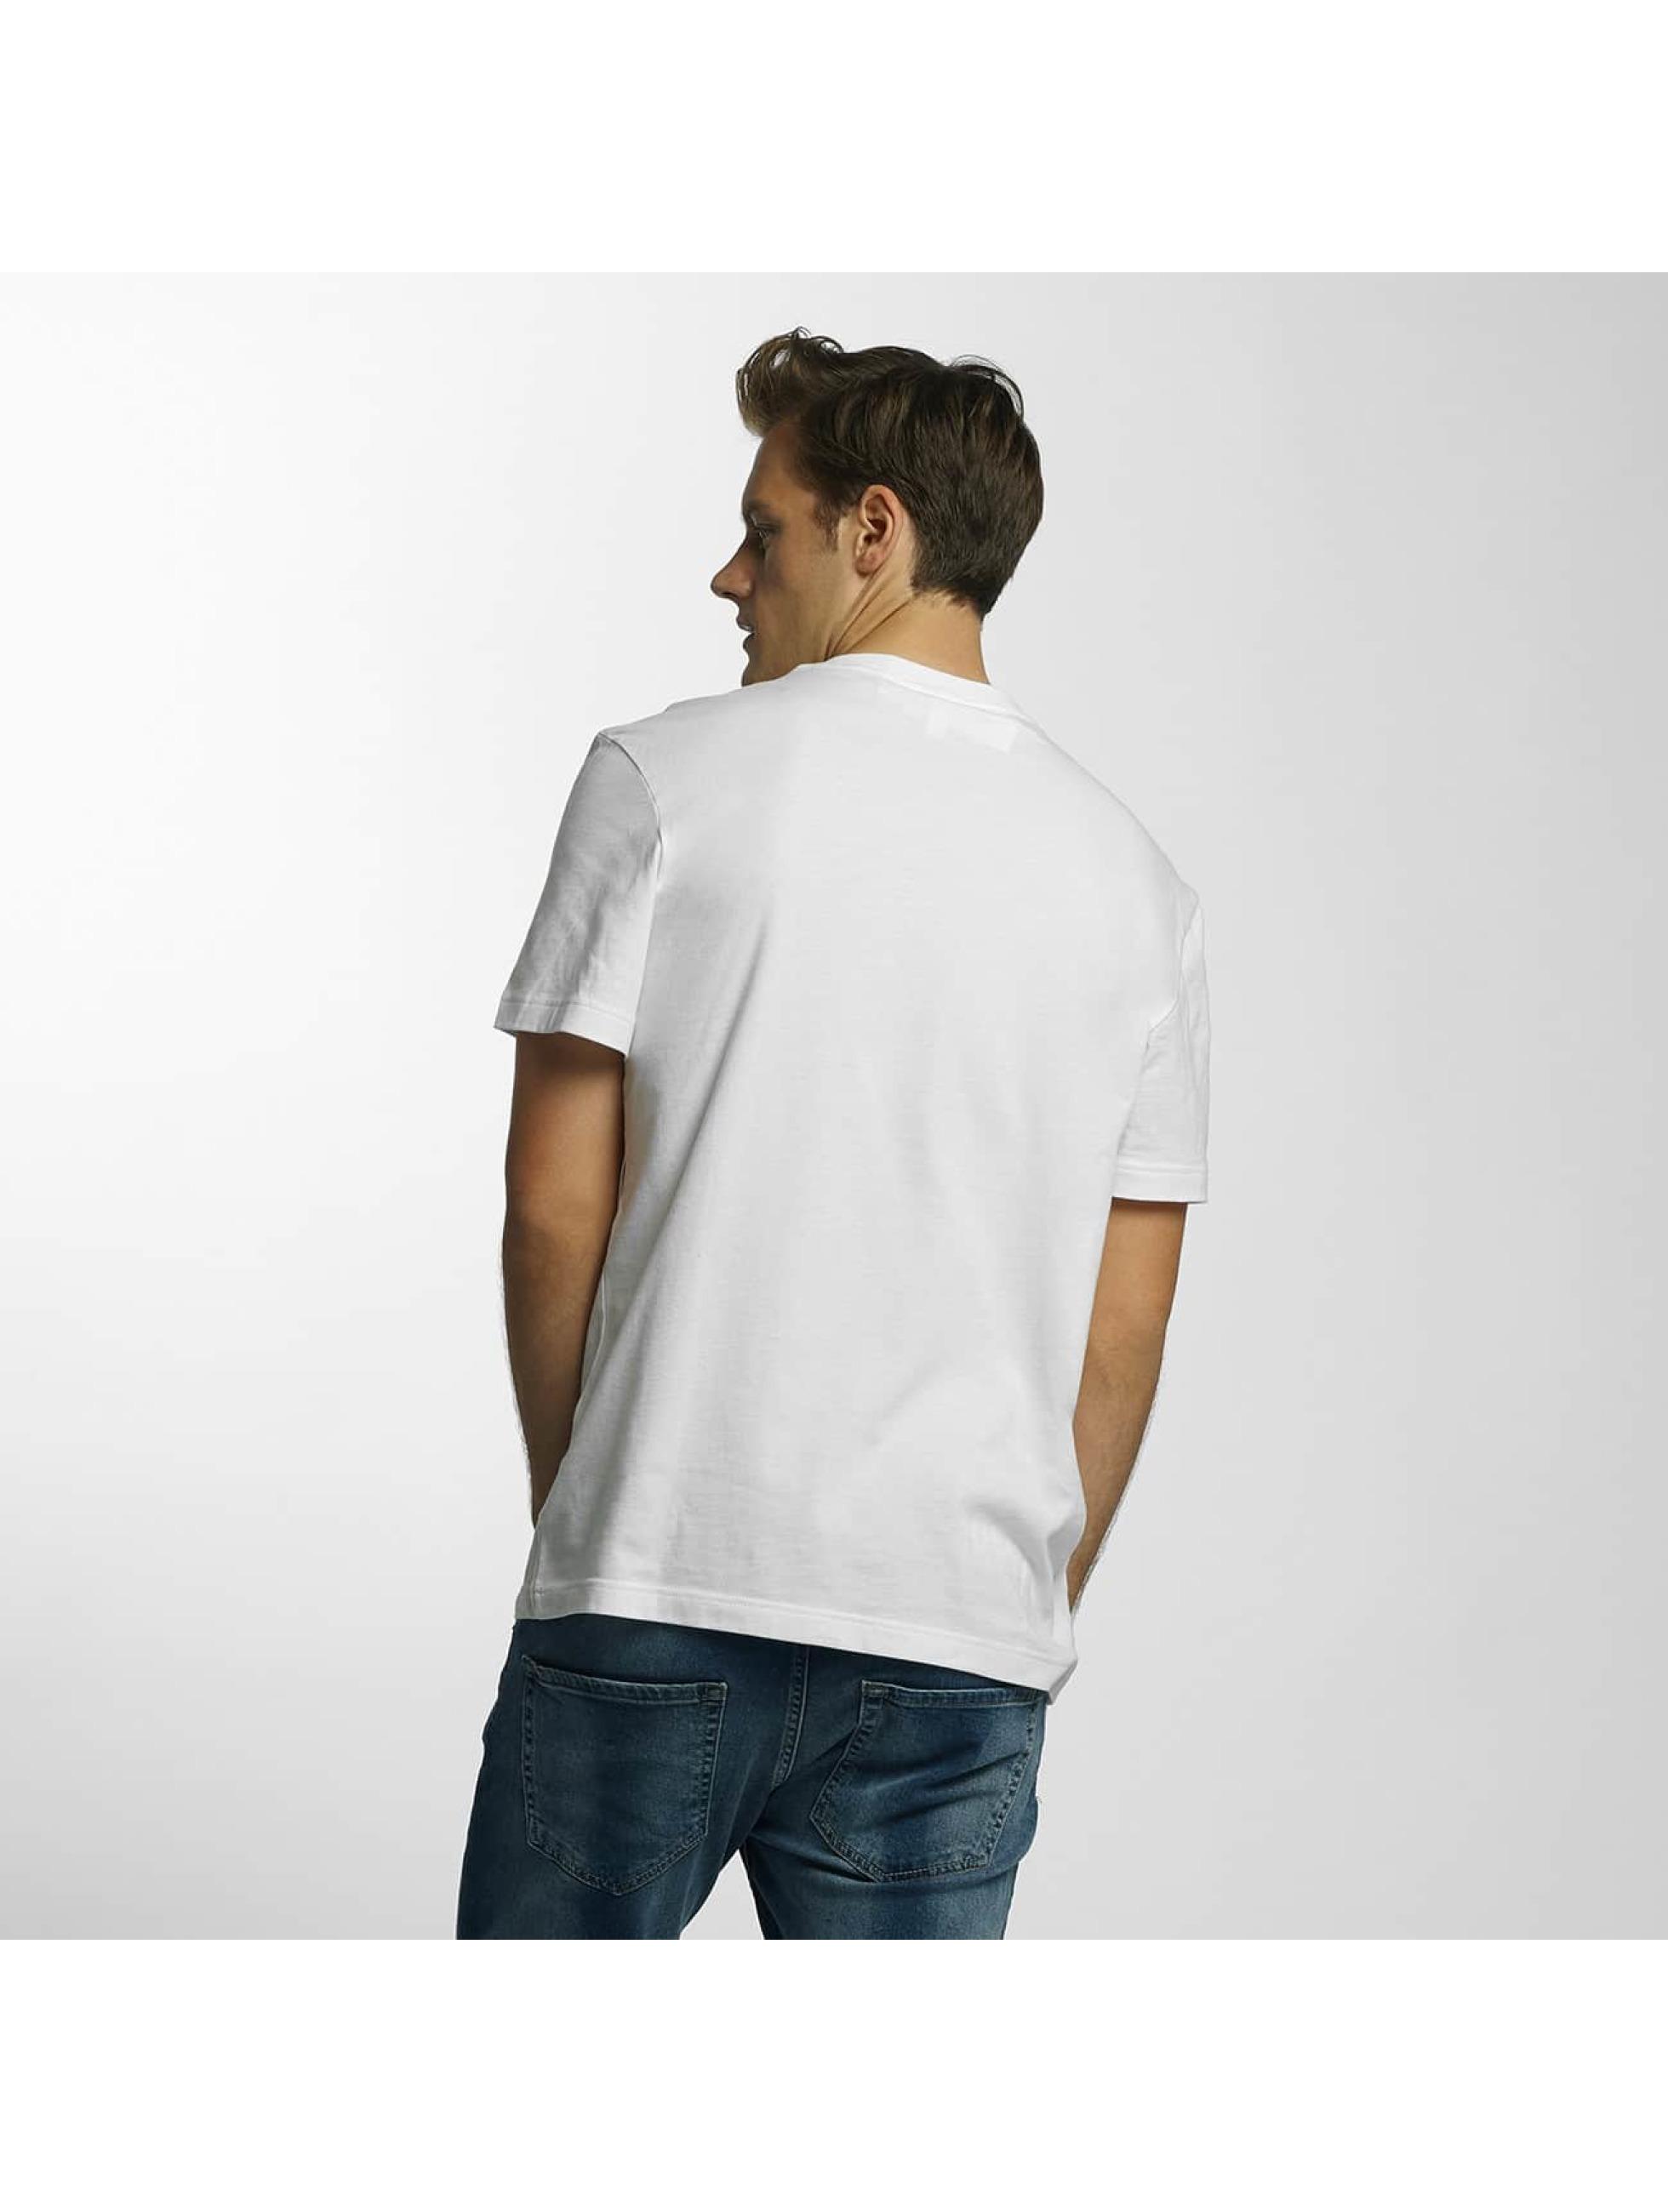 Lacoste T-Shirt Original white